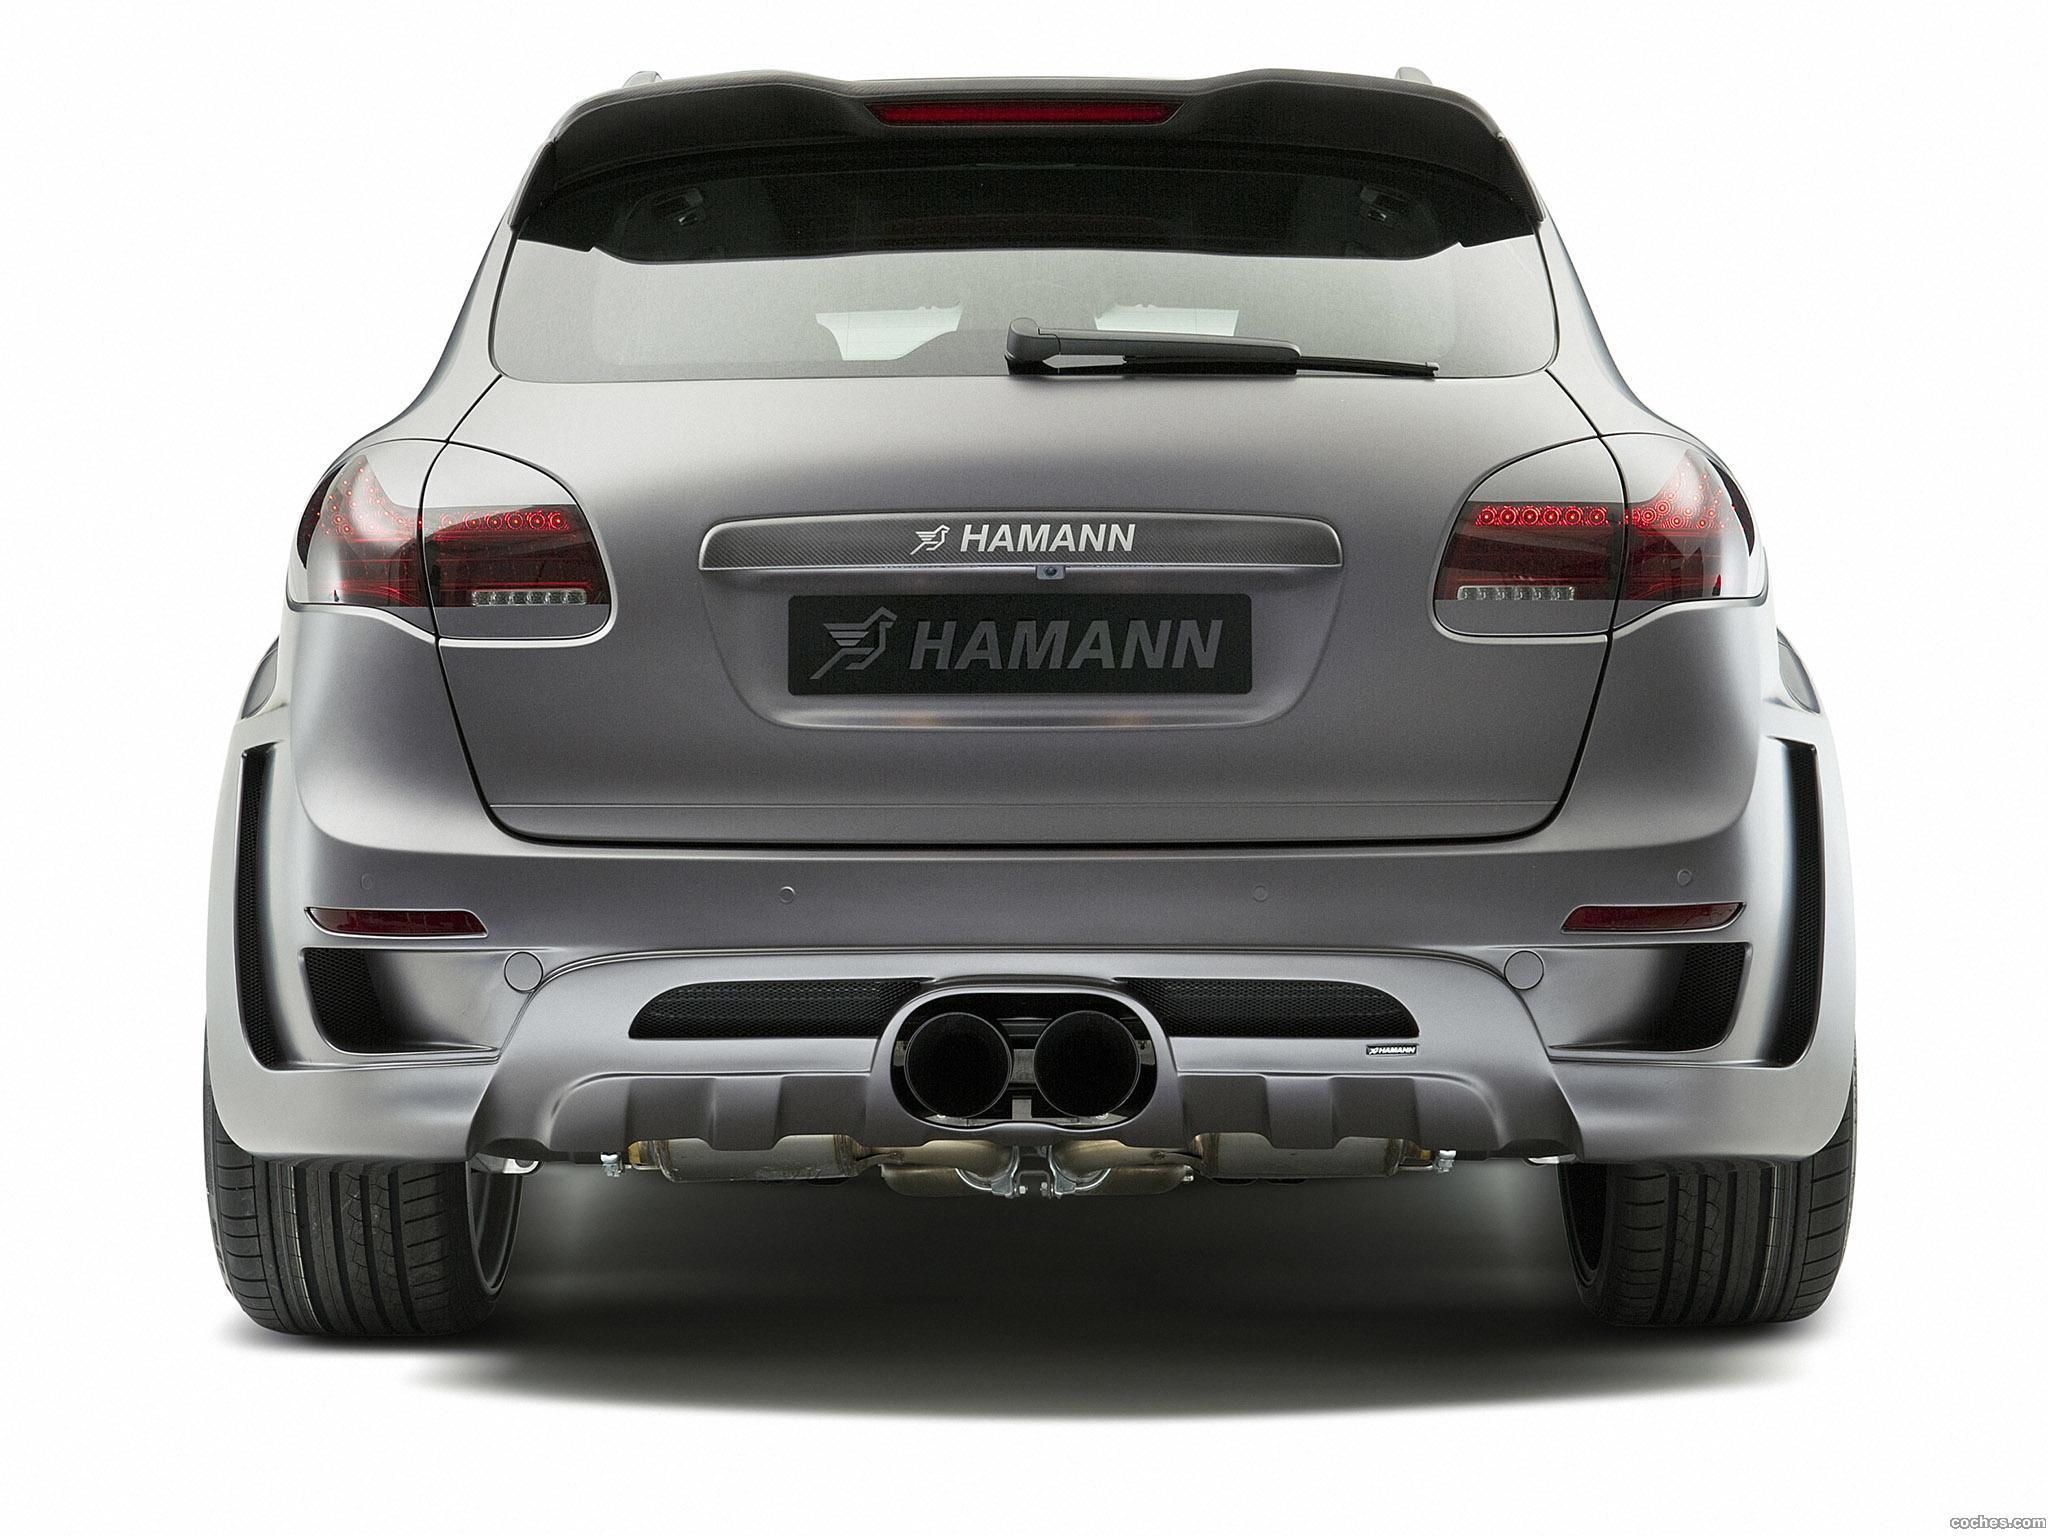 Foto 1 de Hamann Porsche Cayenne Guardian 2011